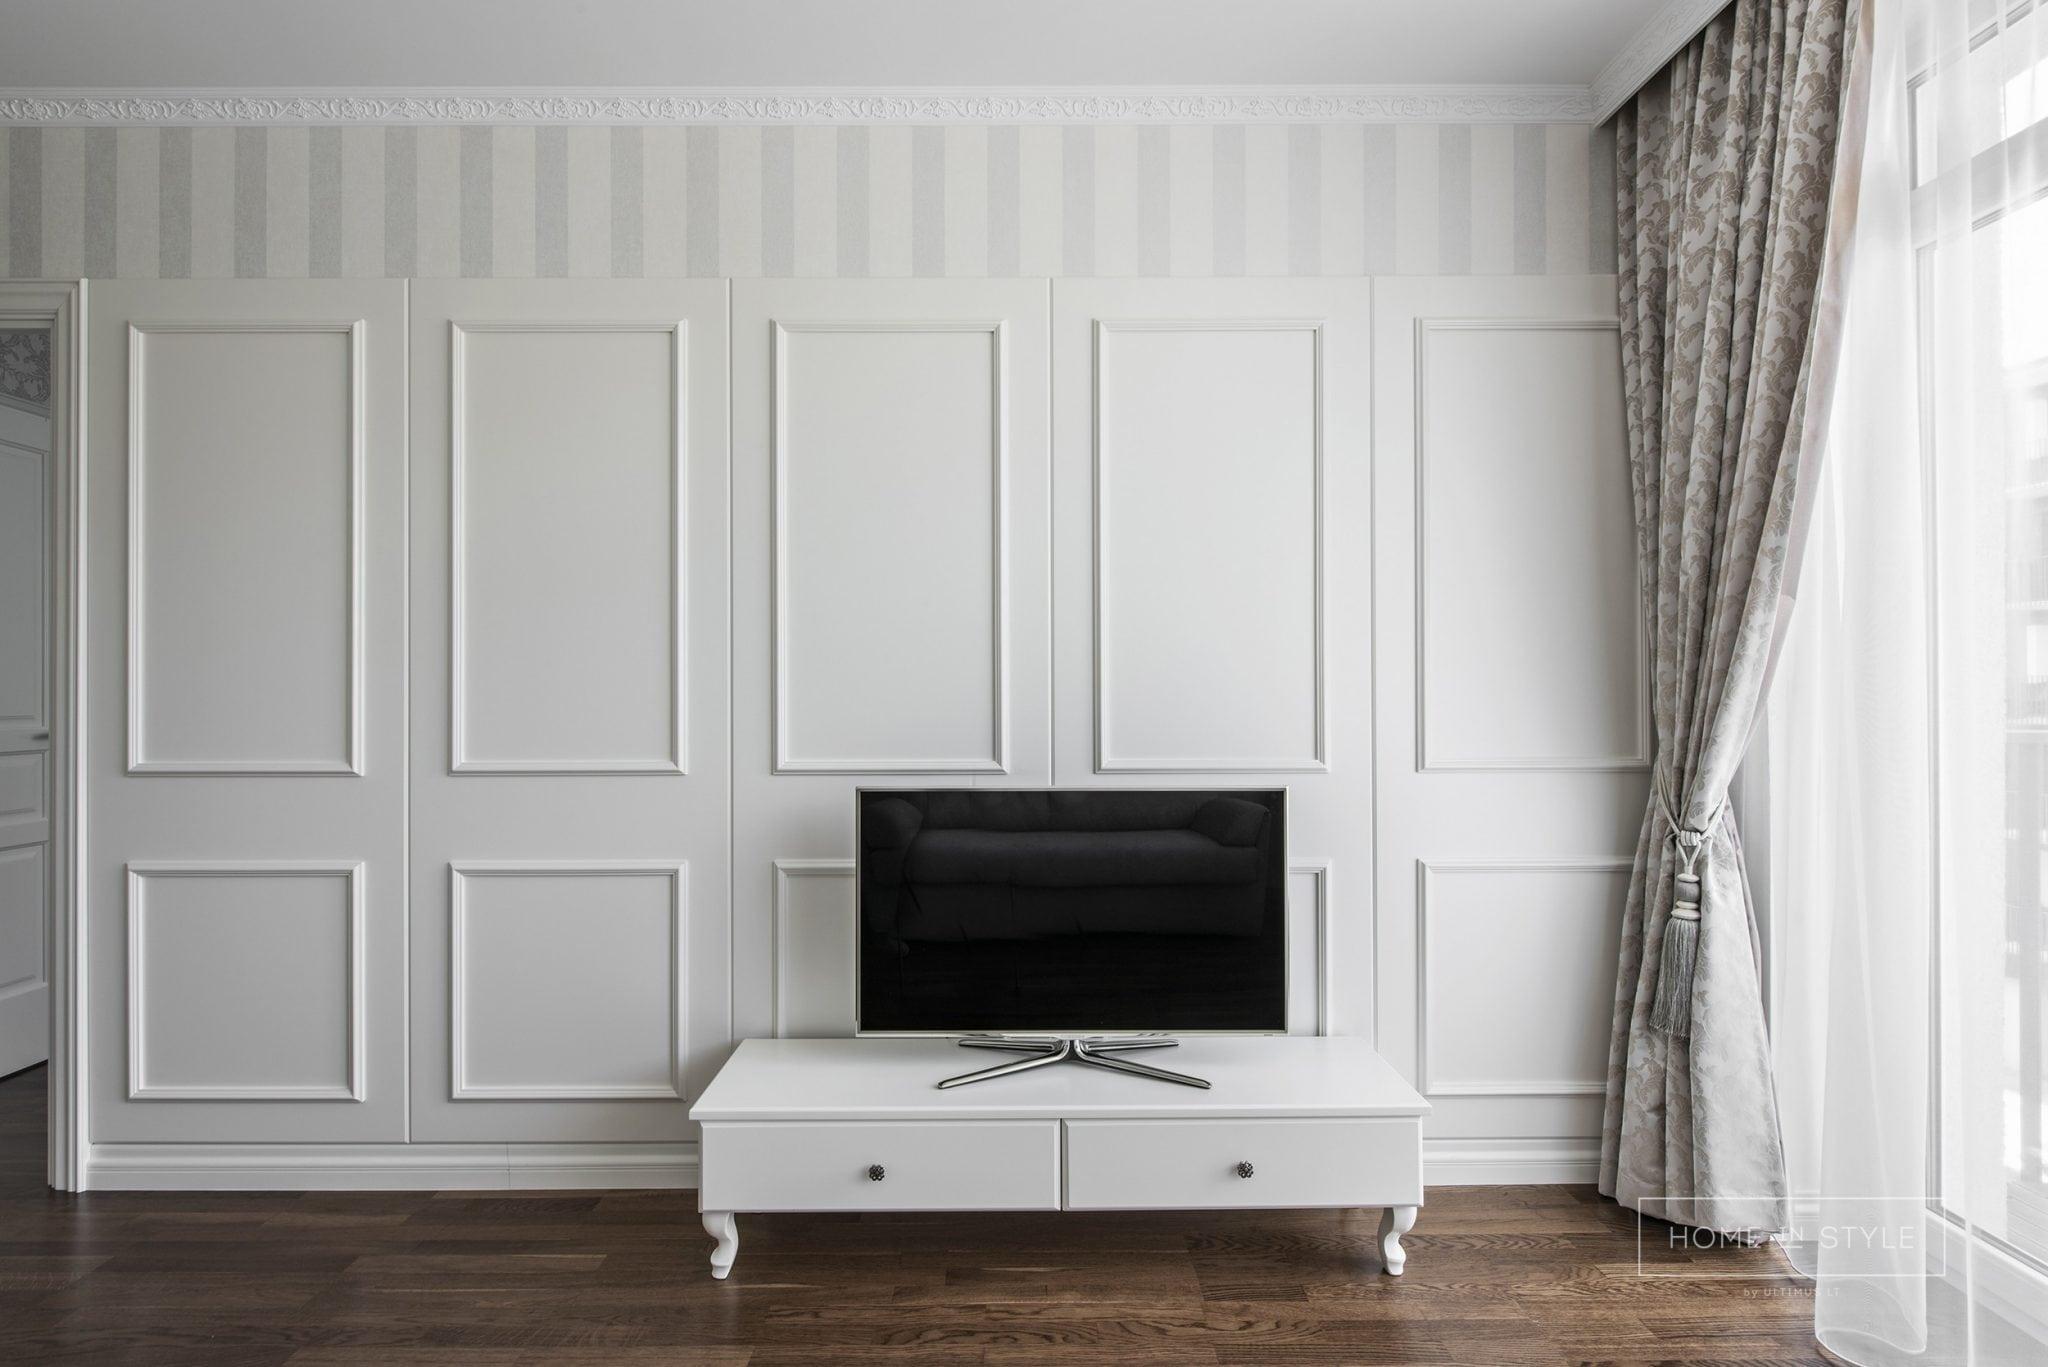 Klasikinis interjeras svetaines baldu gamyba Home in style